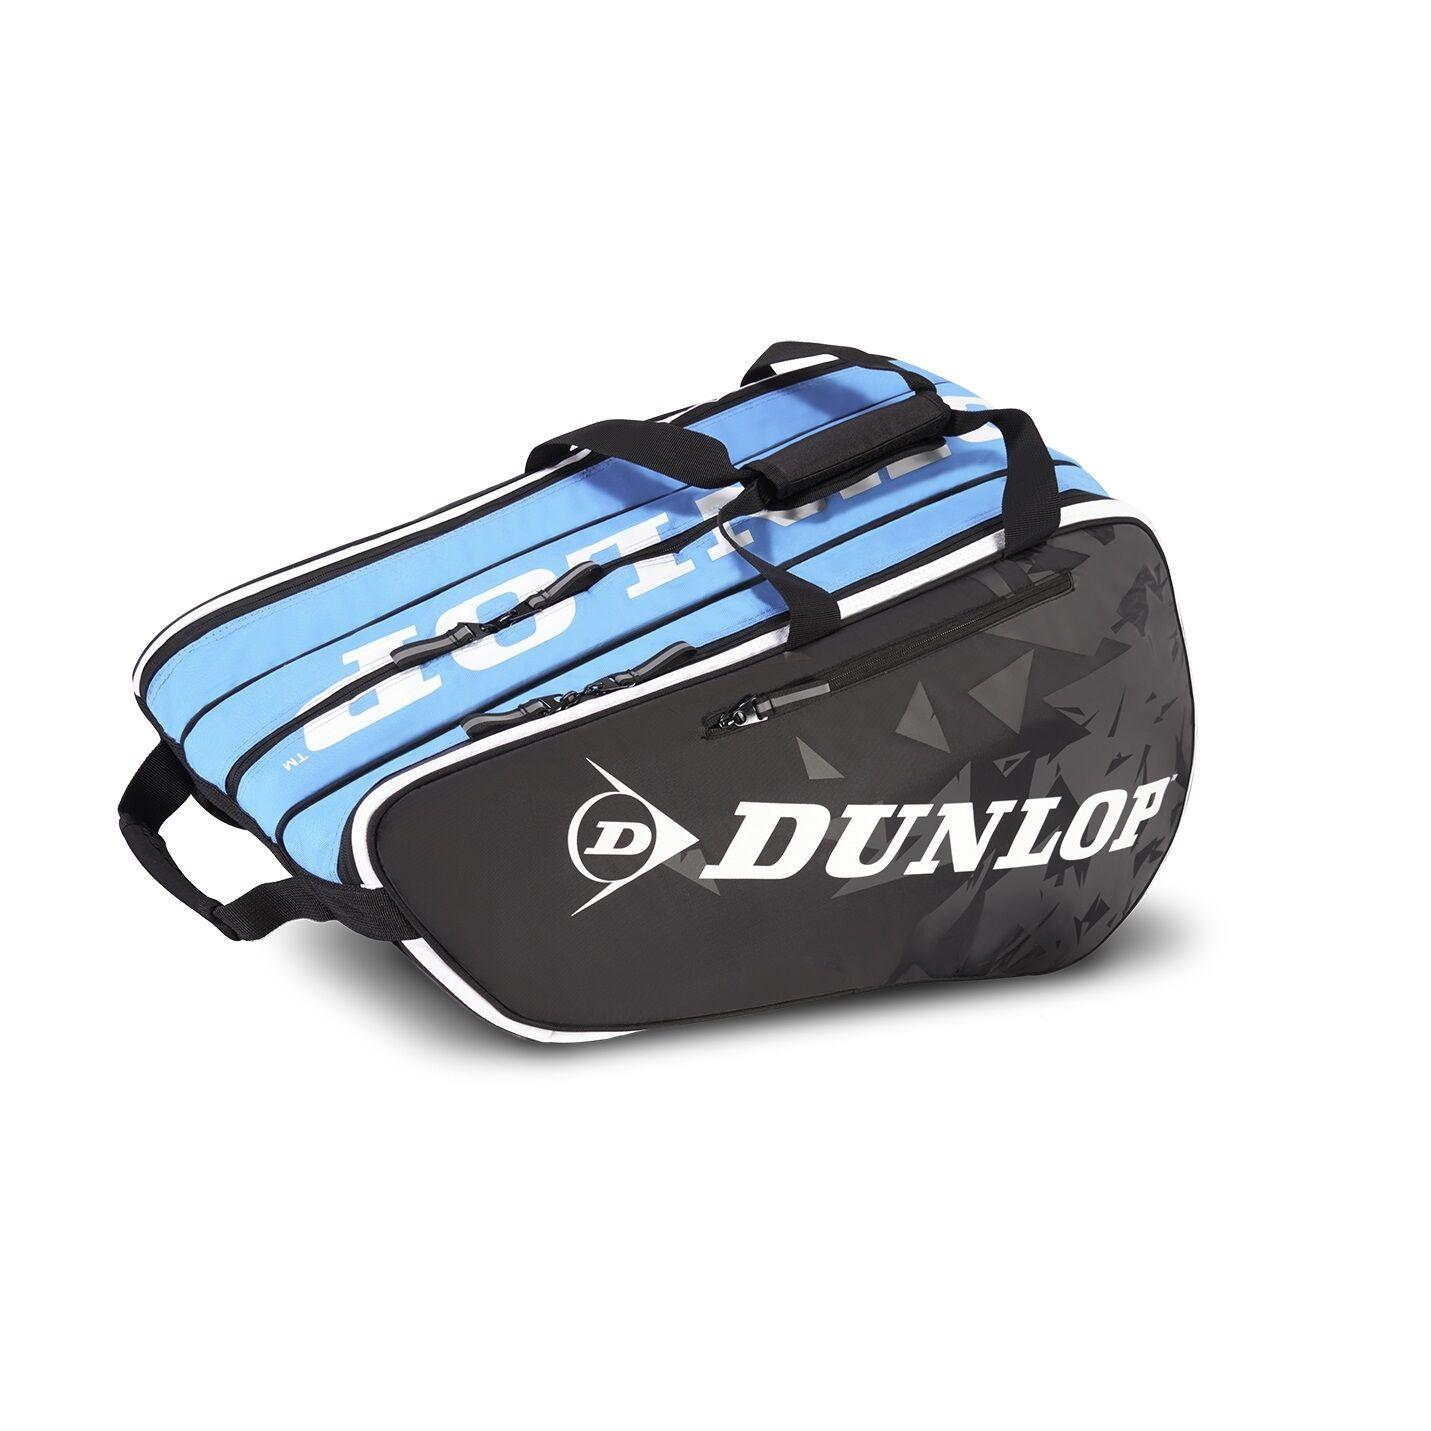 Dunlop Tour 10 Racket Bag 2.0 Black/Blue